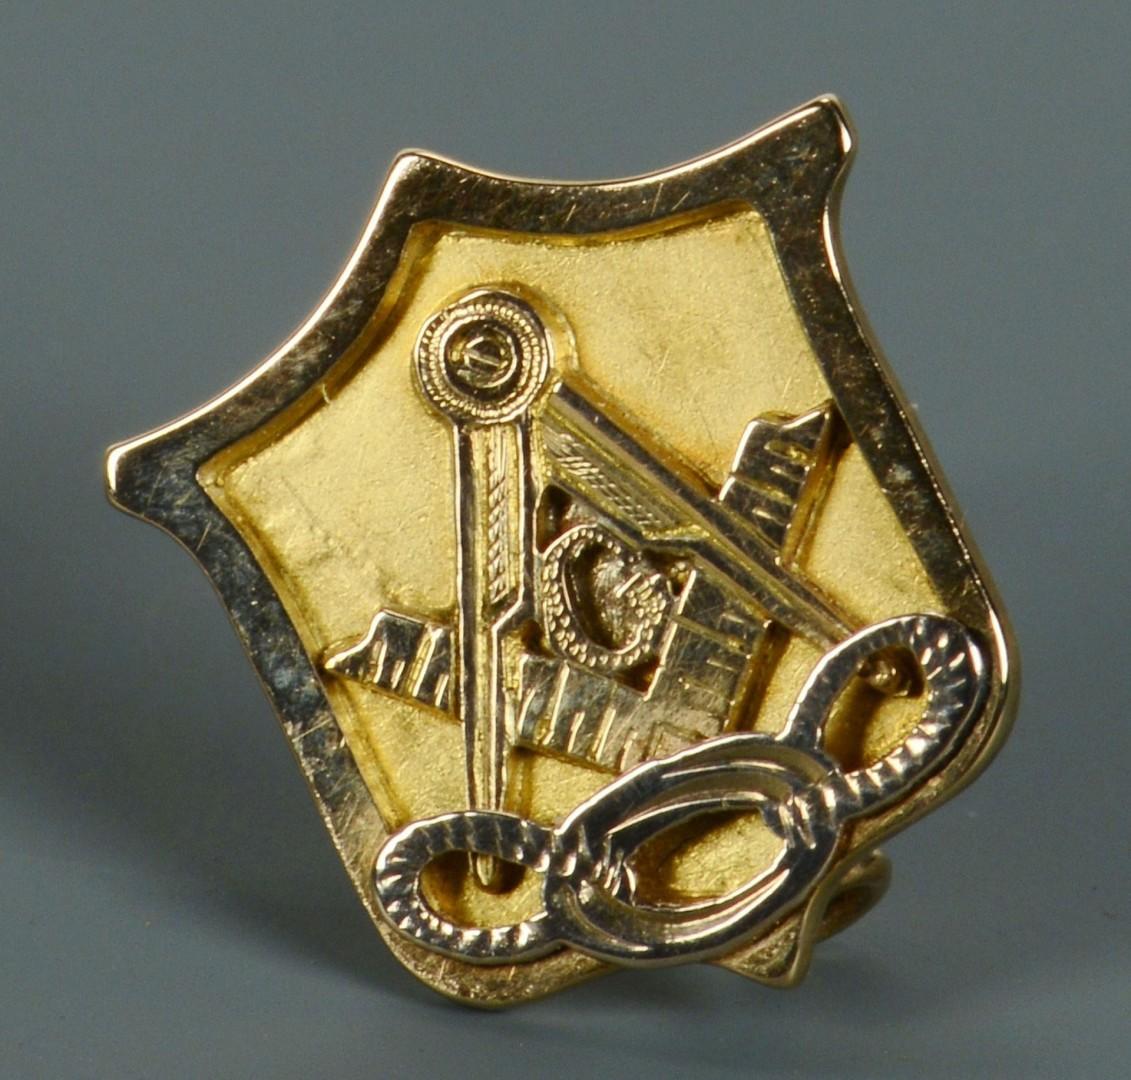 Lot 77: 14k Masonic Pin, Donelson inscription